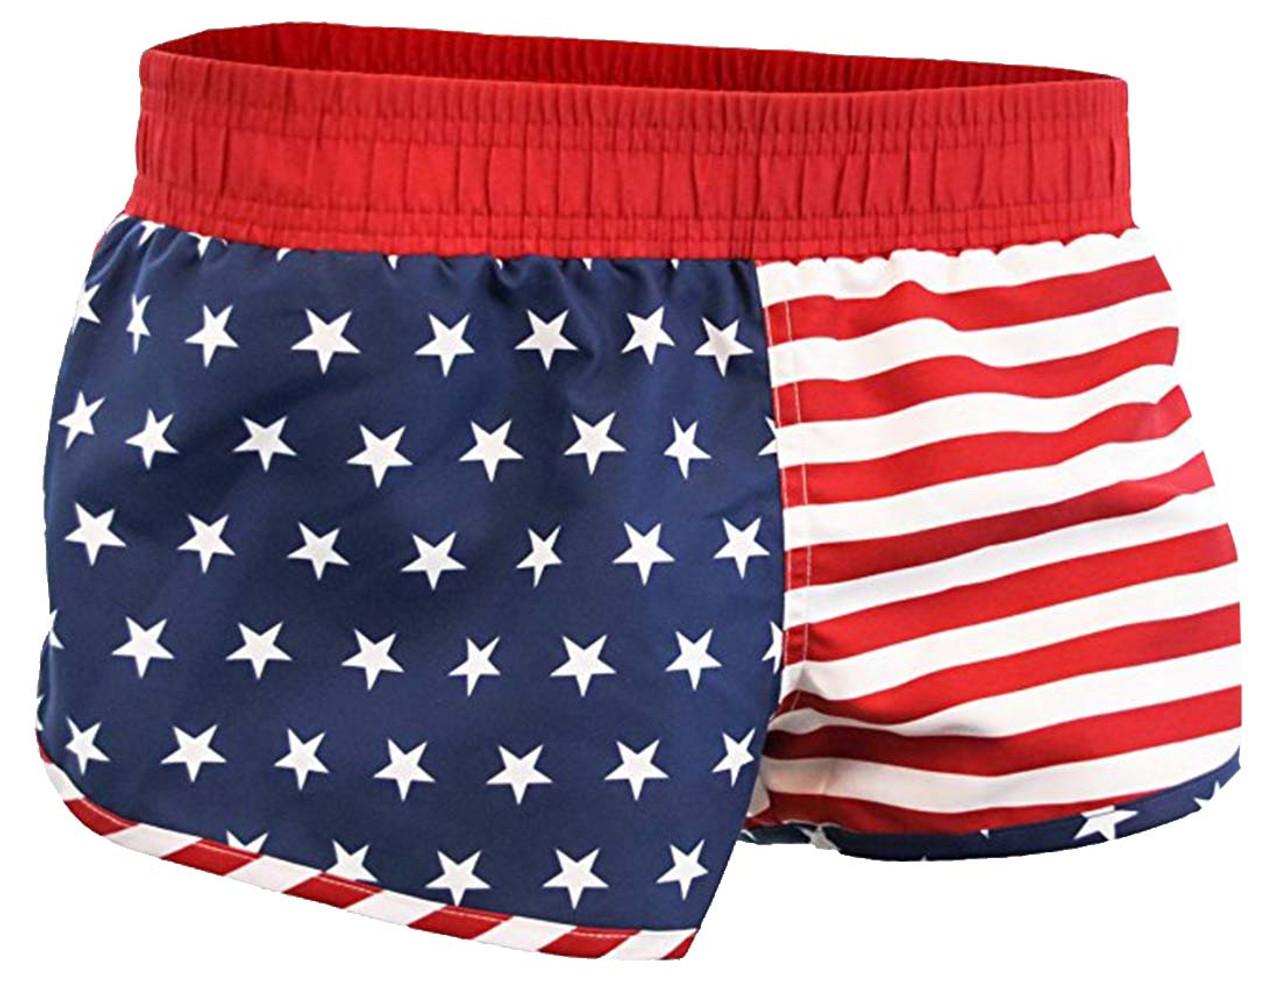 41b41a3f7b Calhoun USA American Flag Womens Printed Shorts - Trenz Shirt Company